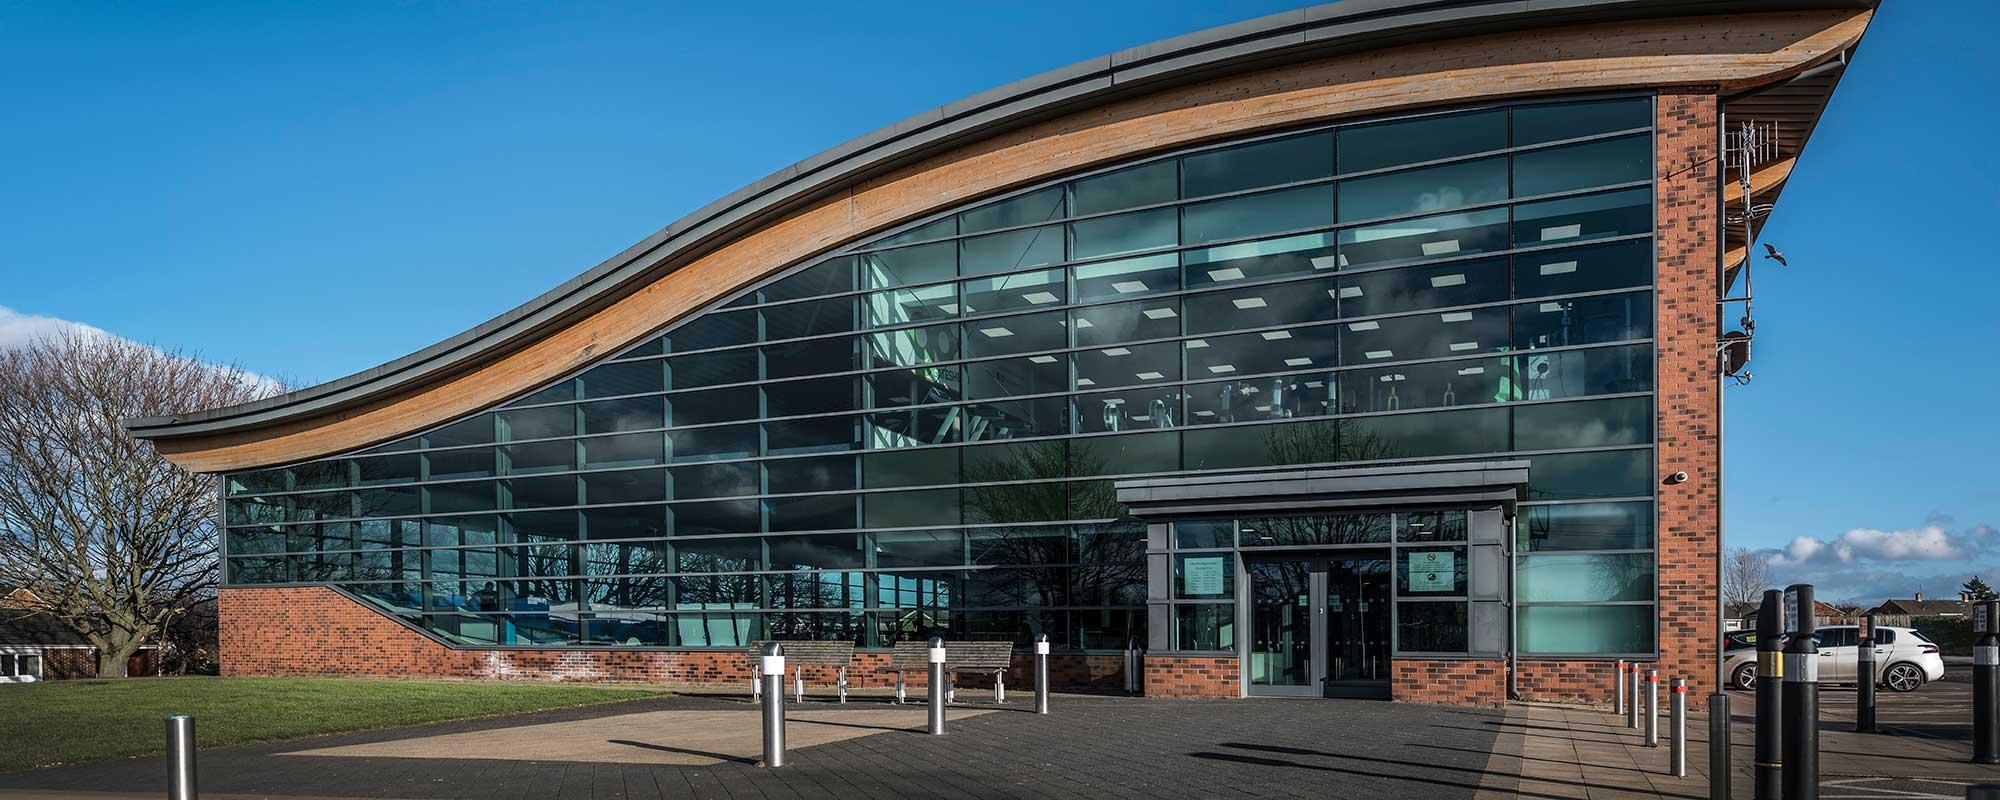 Heworth Leisure Centre landing page